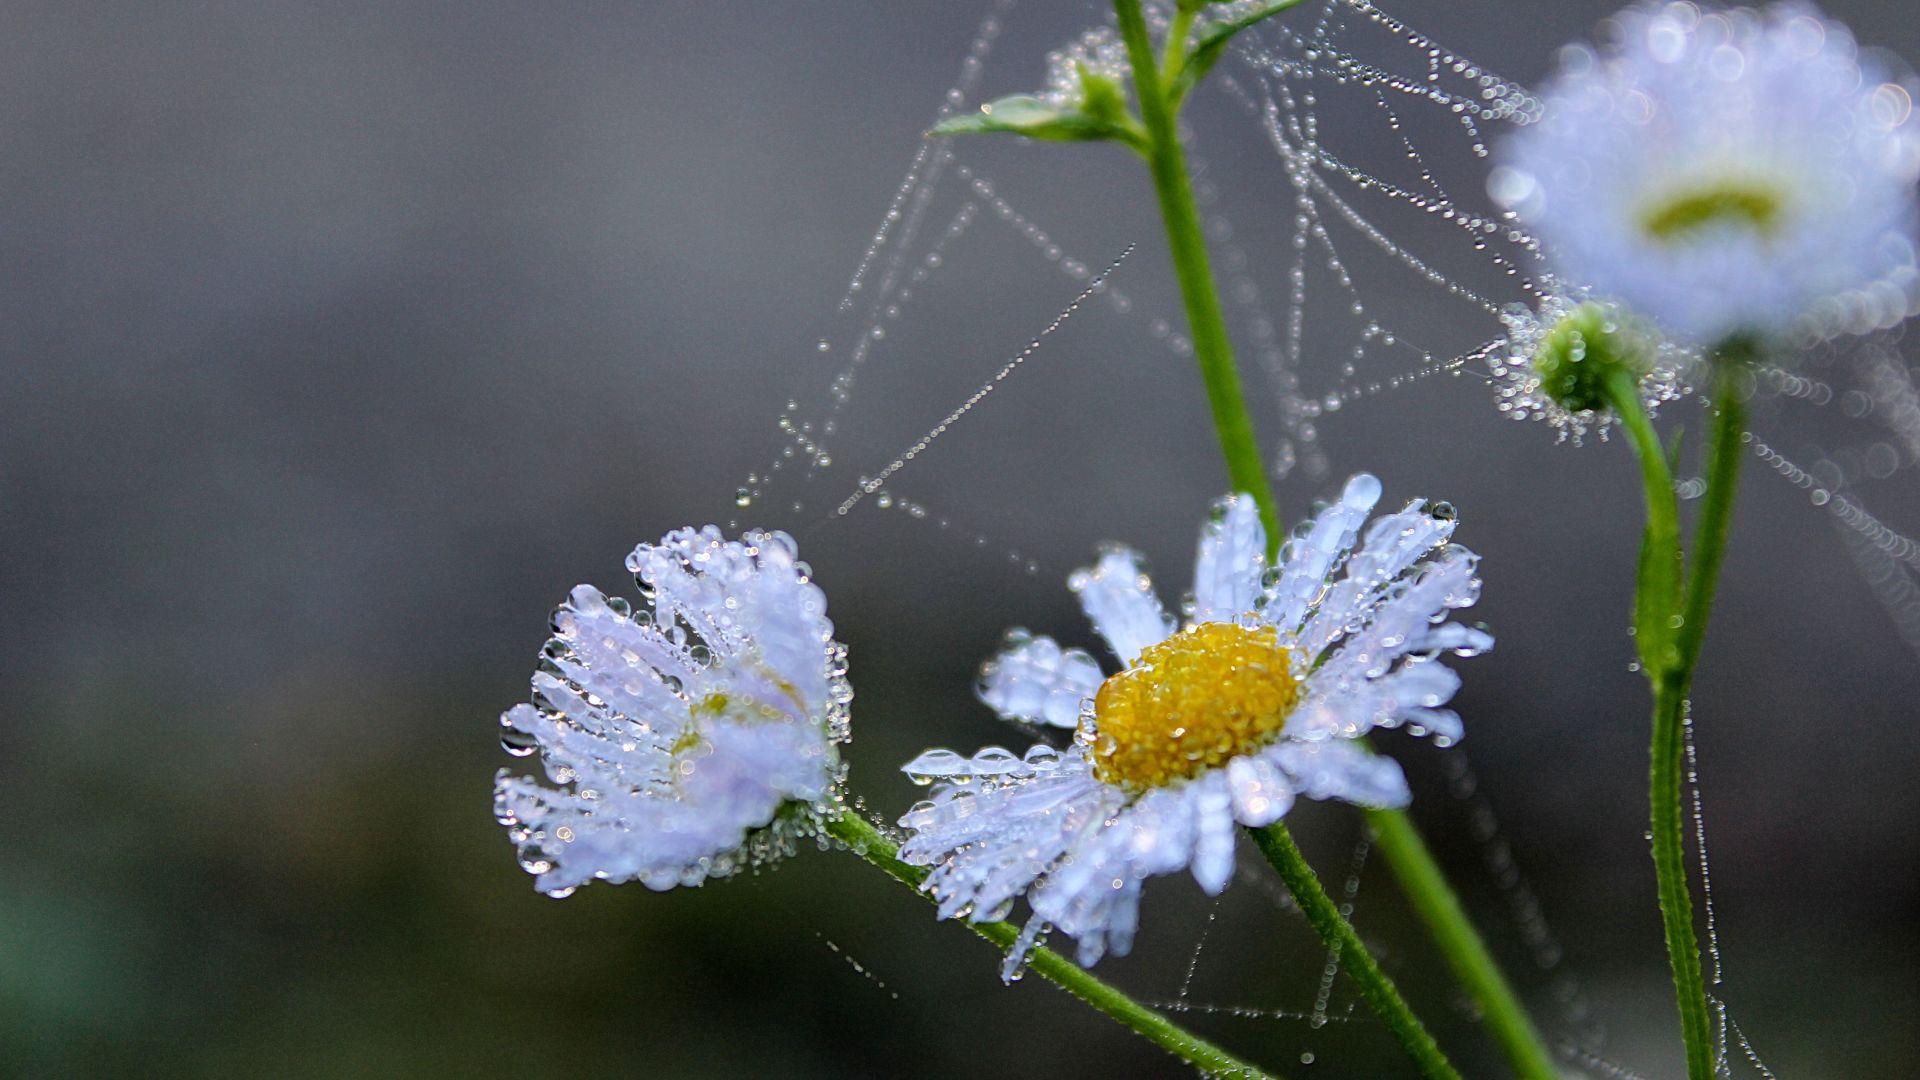 Wallpaper Flower, water drops, daisy, spider web